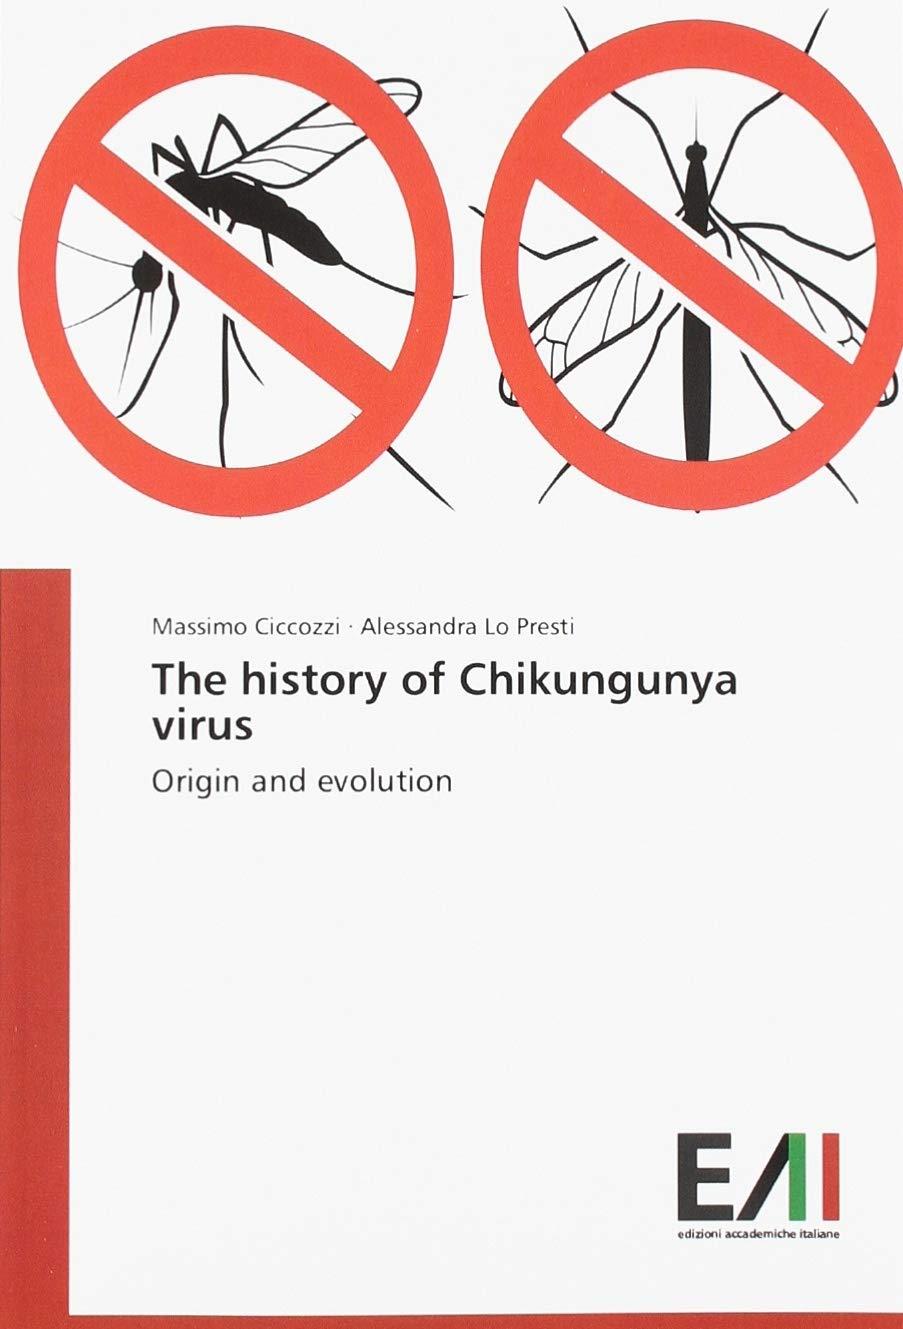 The history of Chikungunya virus: Origin and evolution: Amazon.es: Ciccozzi, Massimo, Lo Presti, Alessandra: Libros en idiomas extranjeros